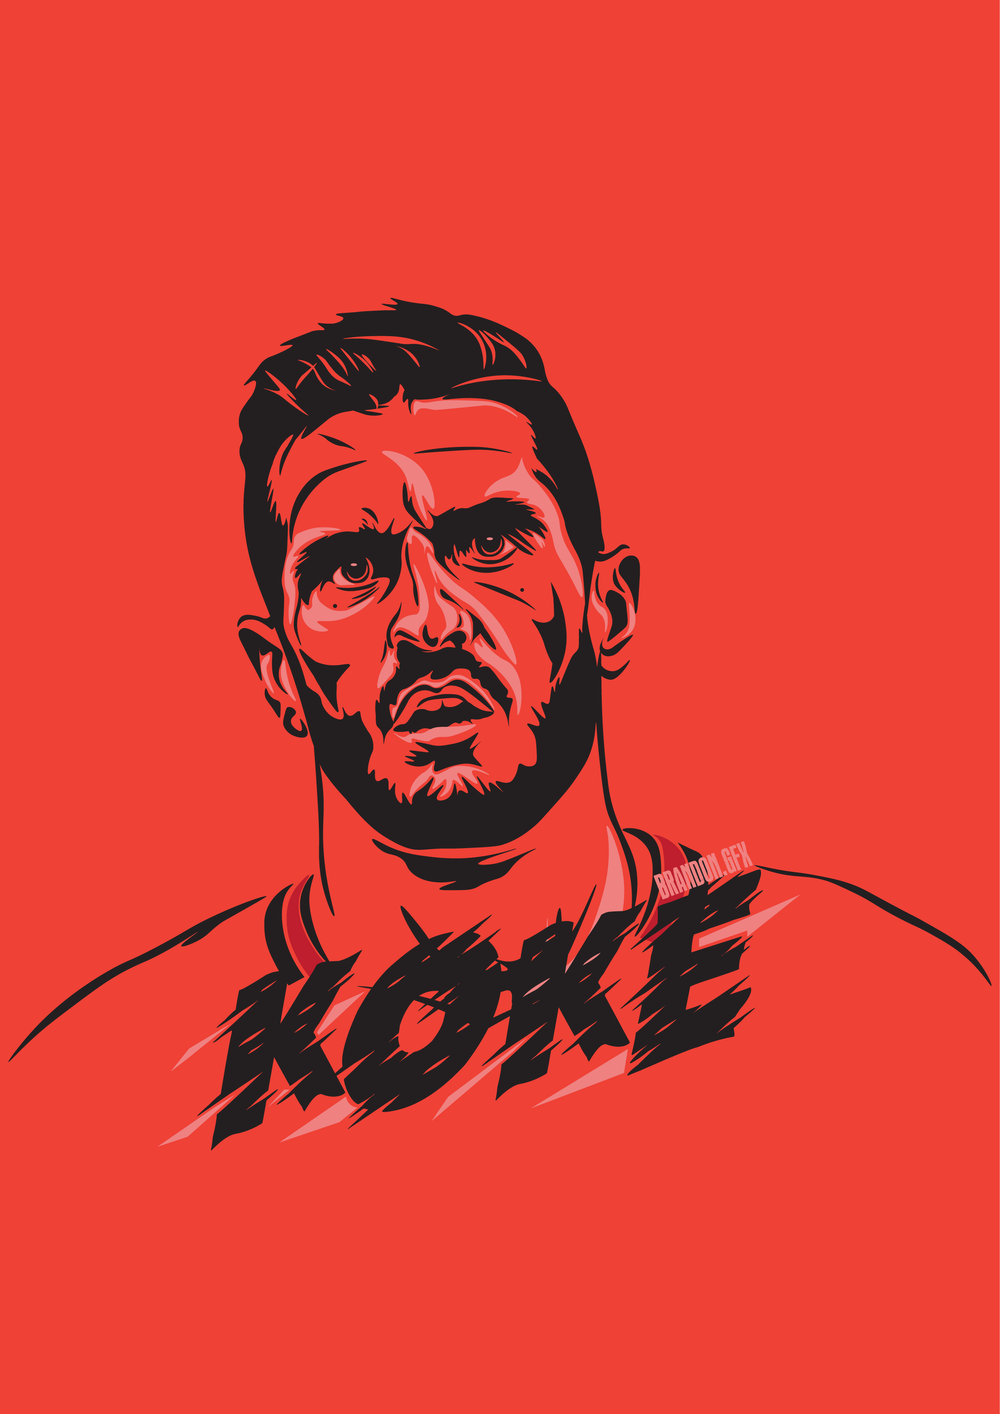 koke-01.png